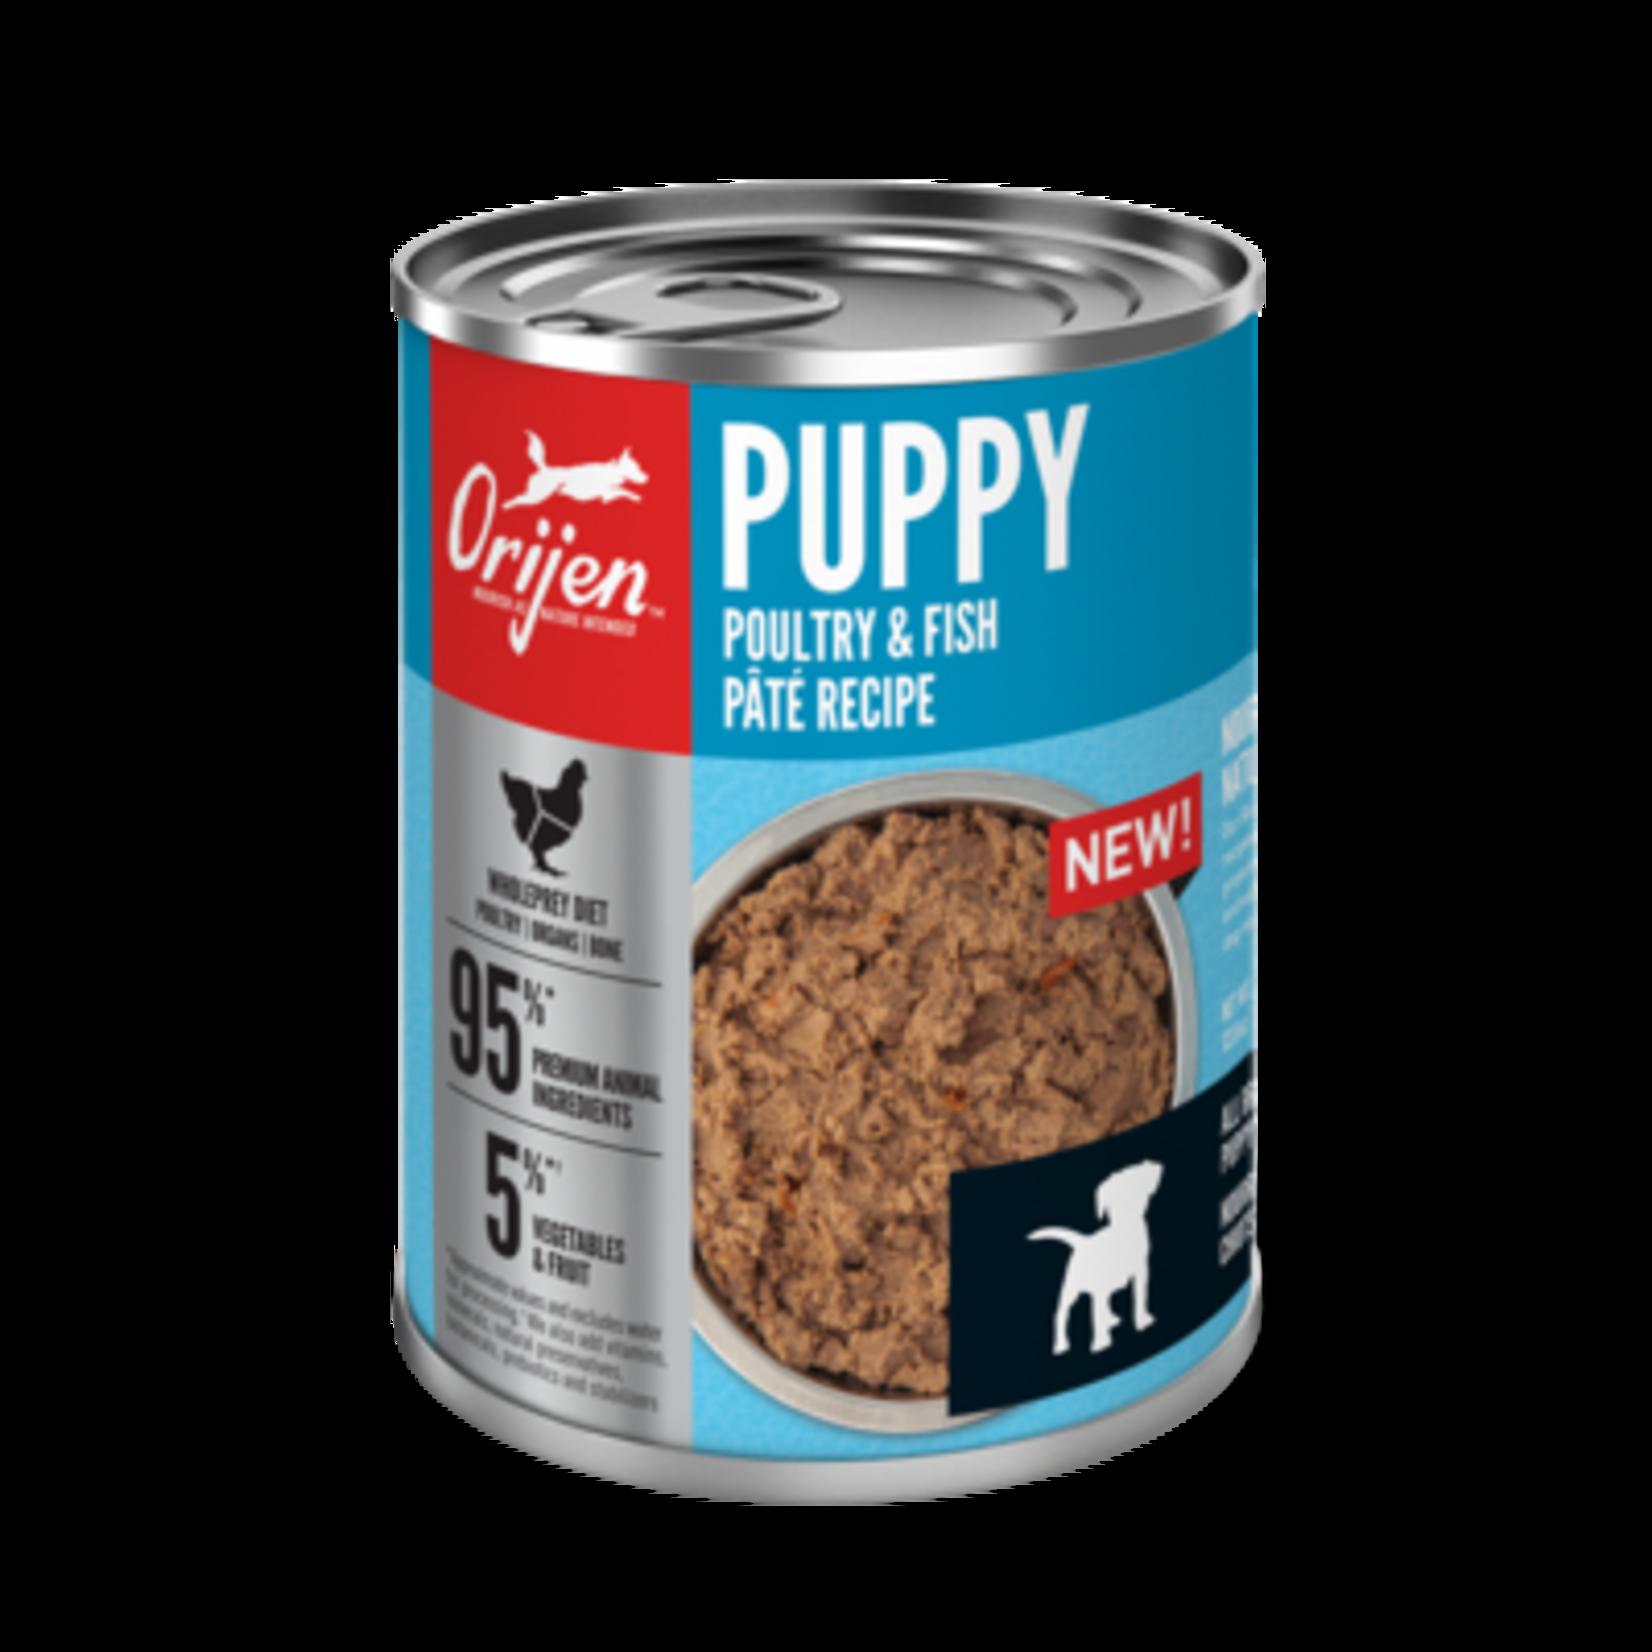 Orijen Orijen Puppy Pate Recipe Dog Can 12.8 oz